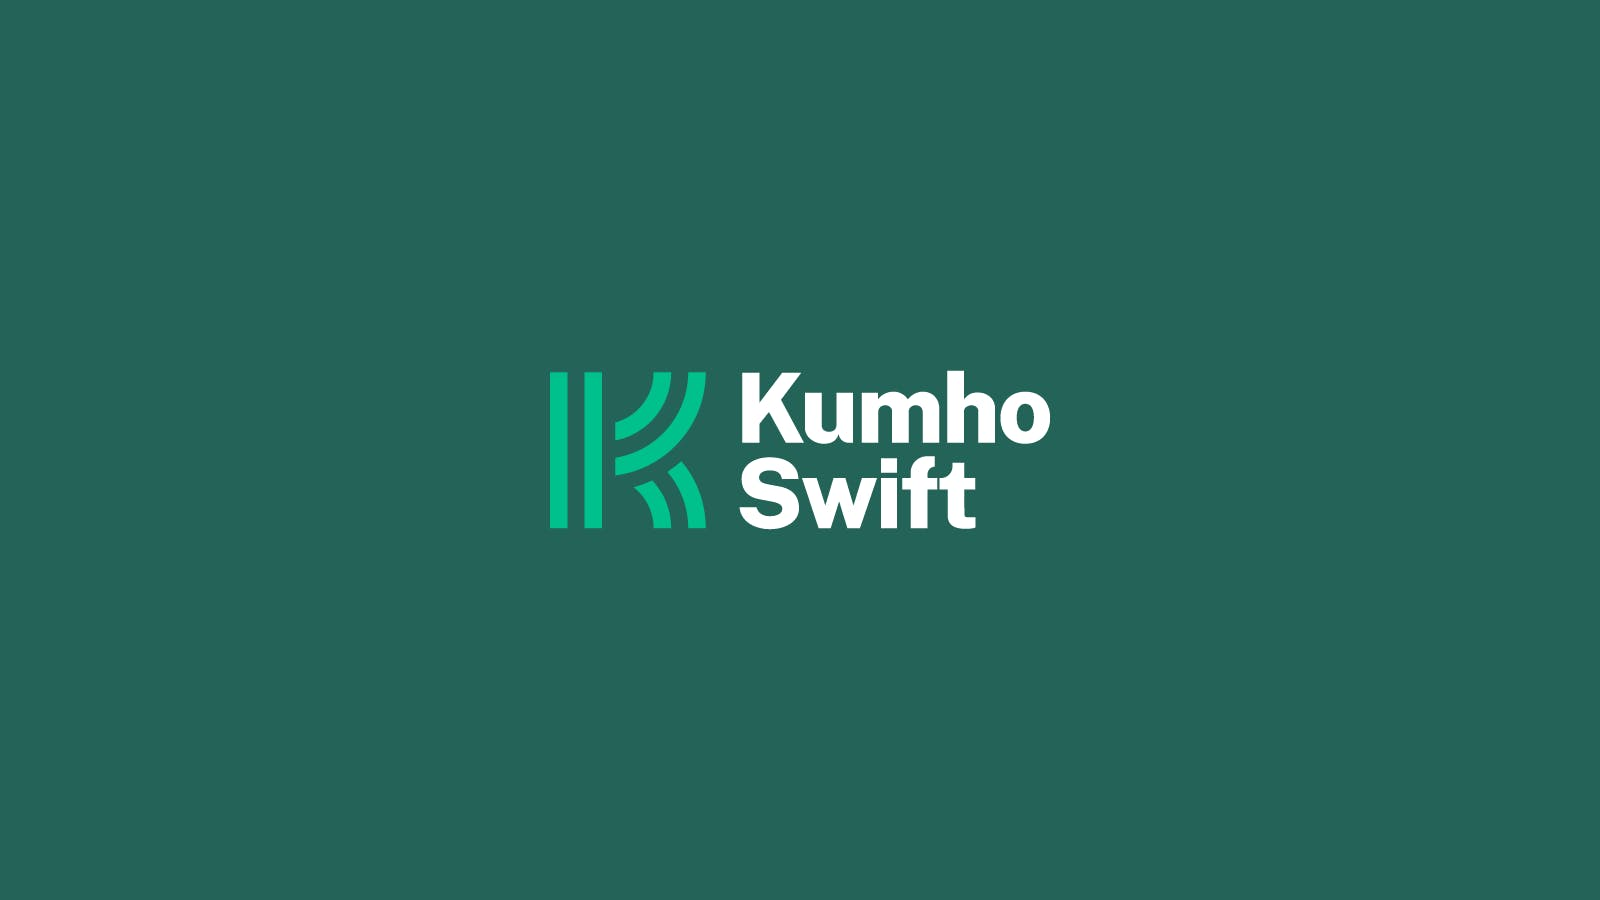 New Kumho Swift logo